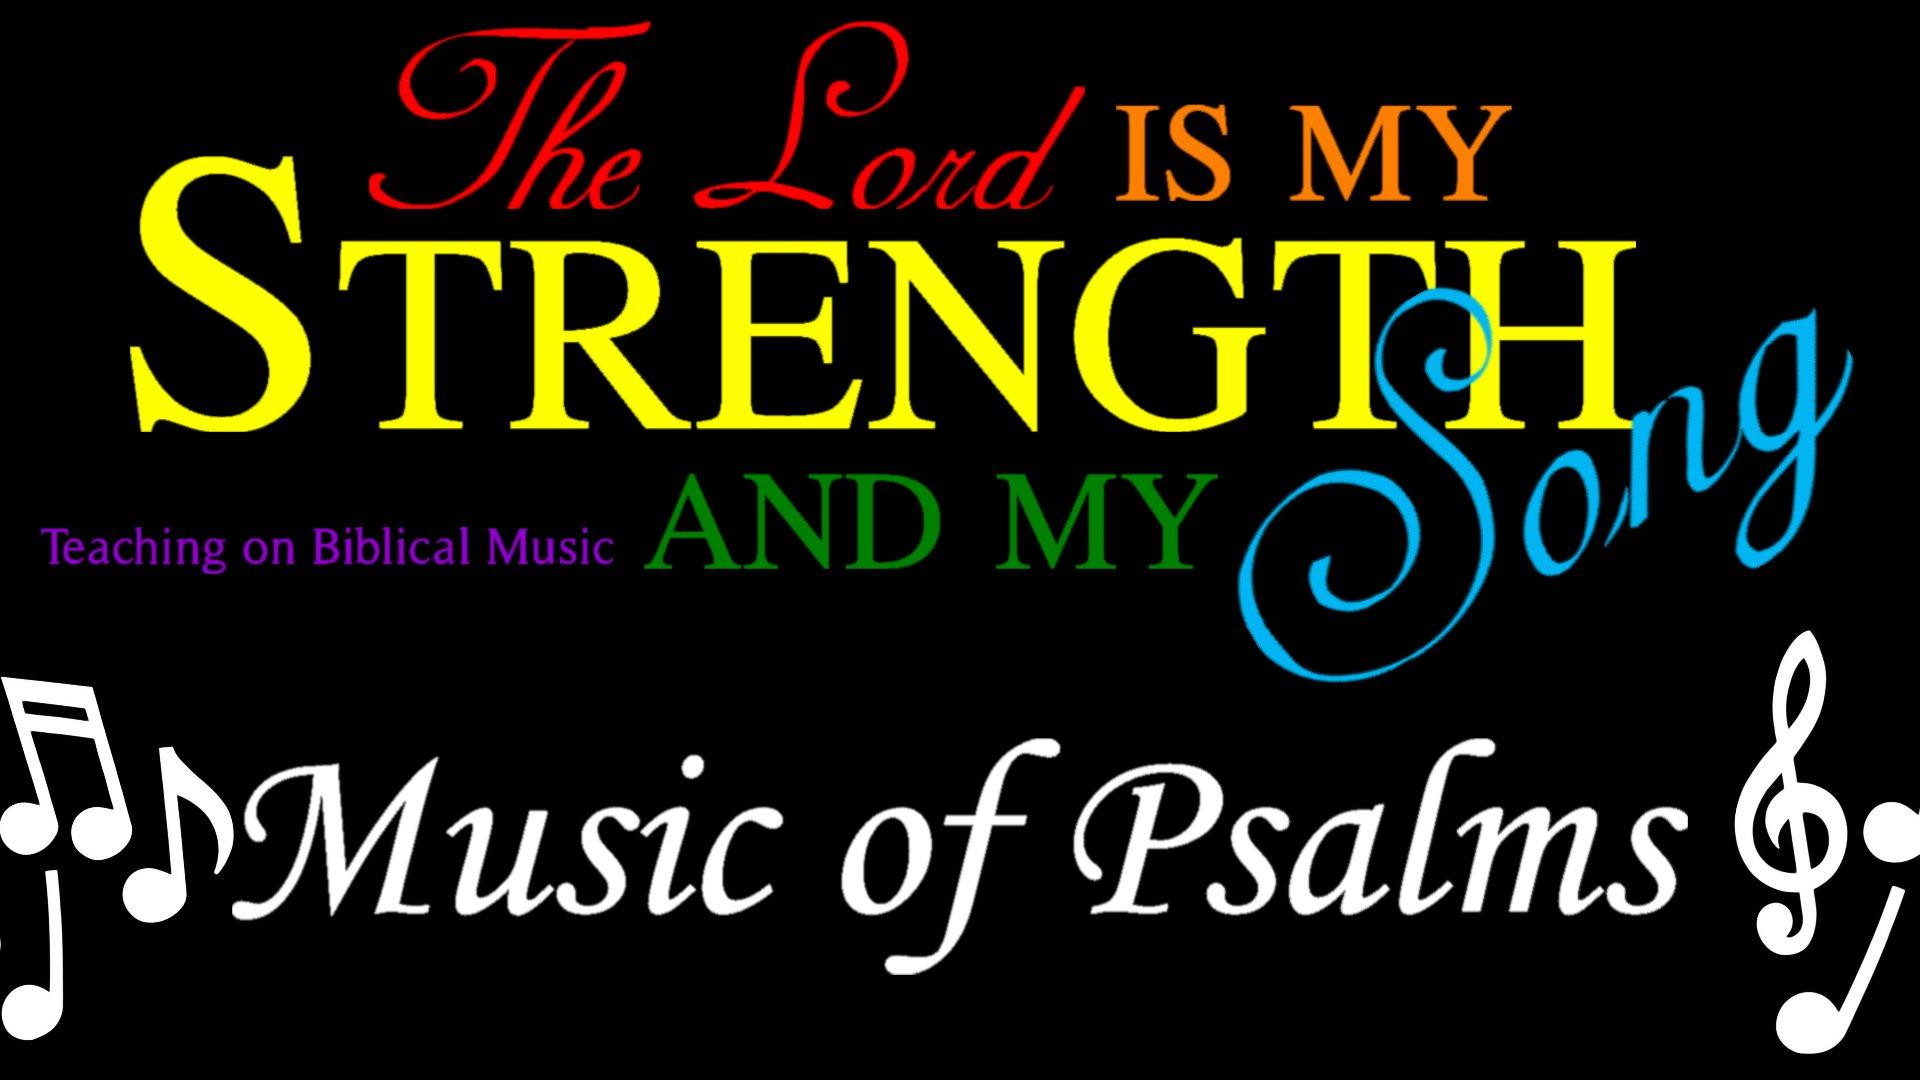 05 Music of Psalms